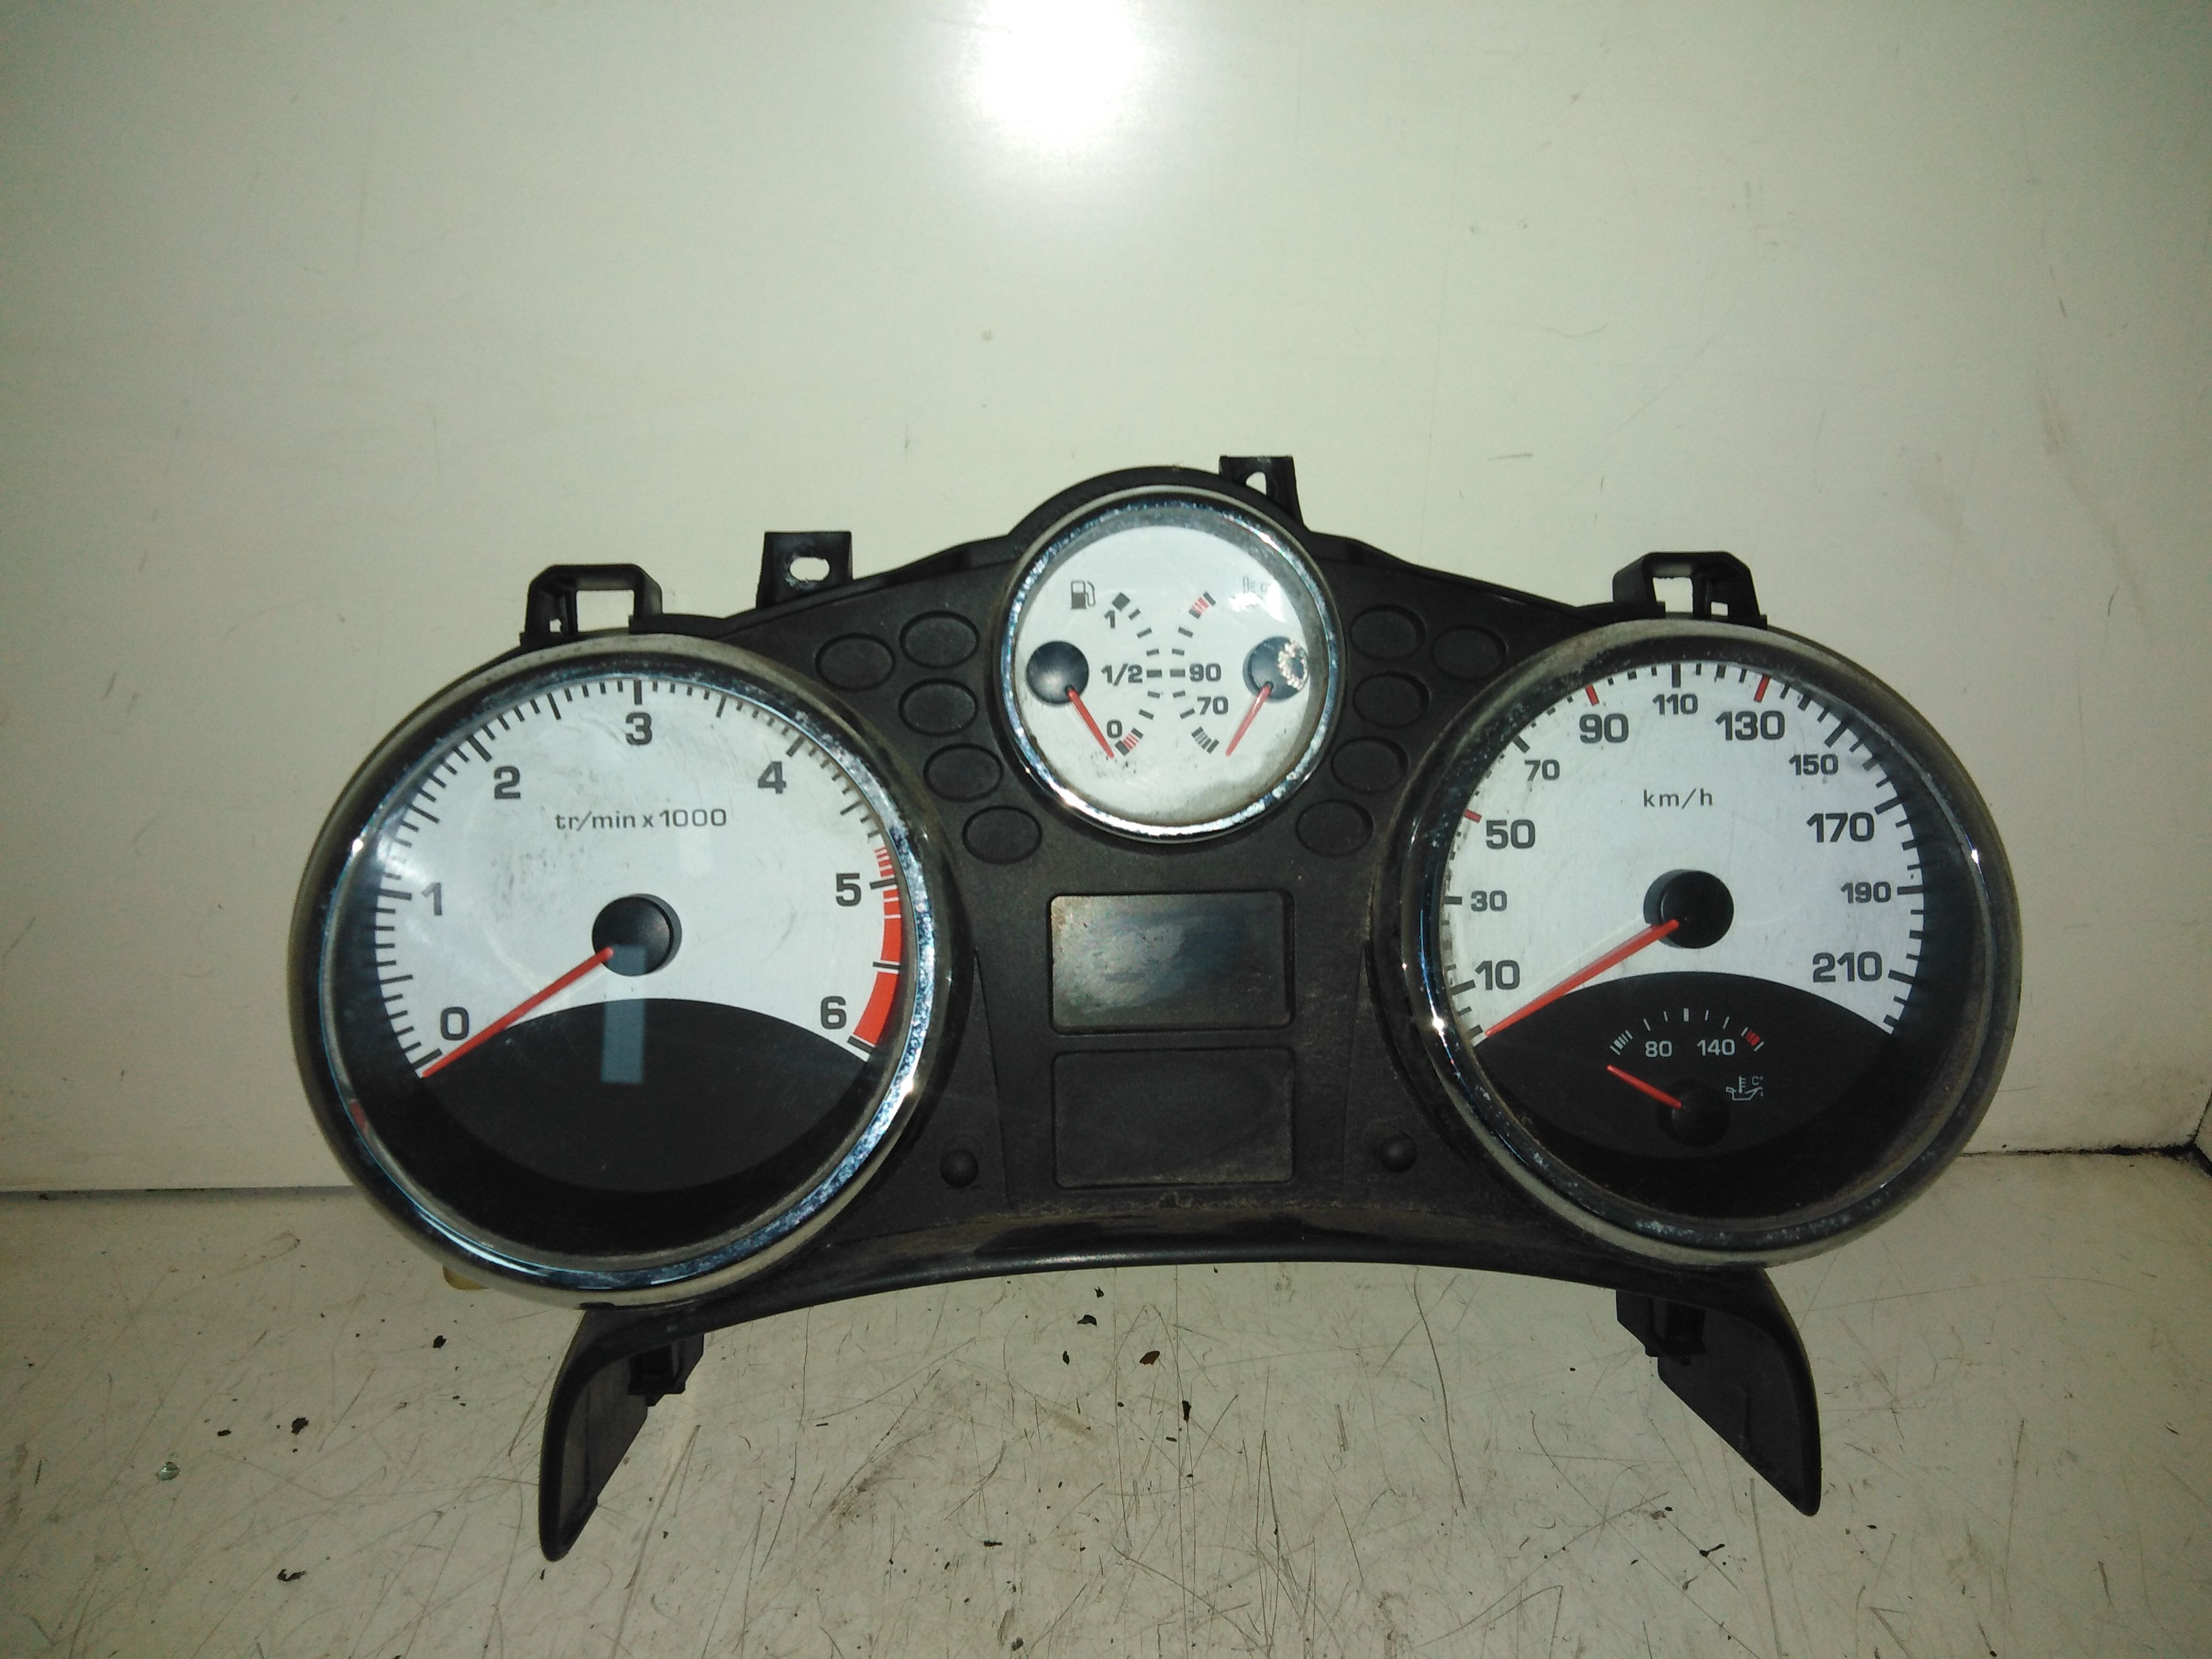 CONTACHILOMETRI PEUGEOT 207 1° Serie 1600 Diesel (2008) RICAMBI USATI